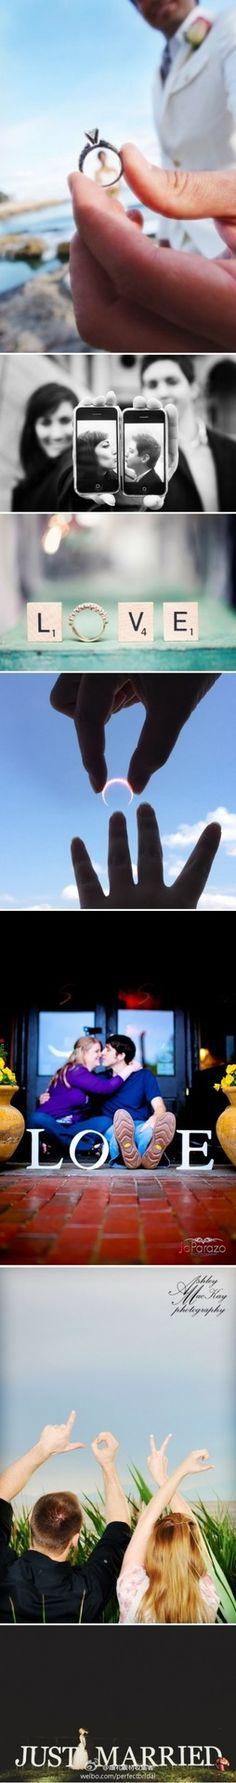 cool engagement shots